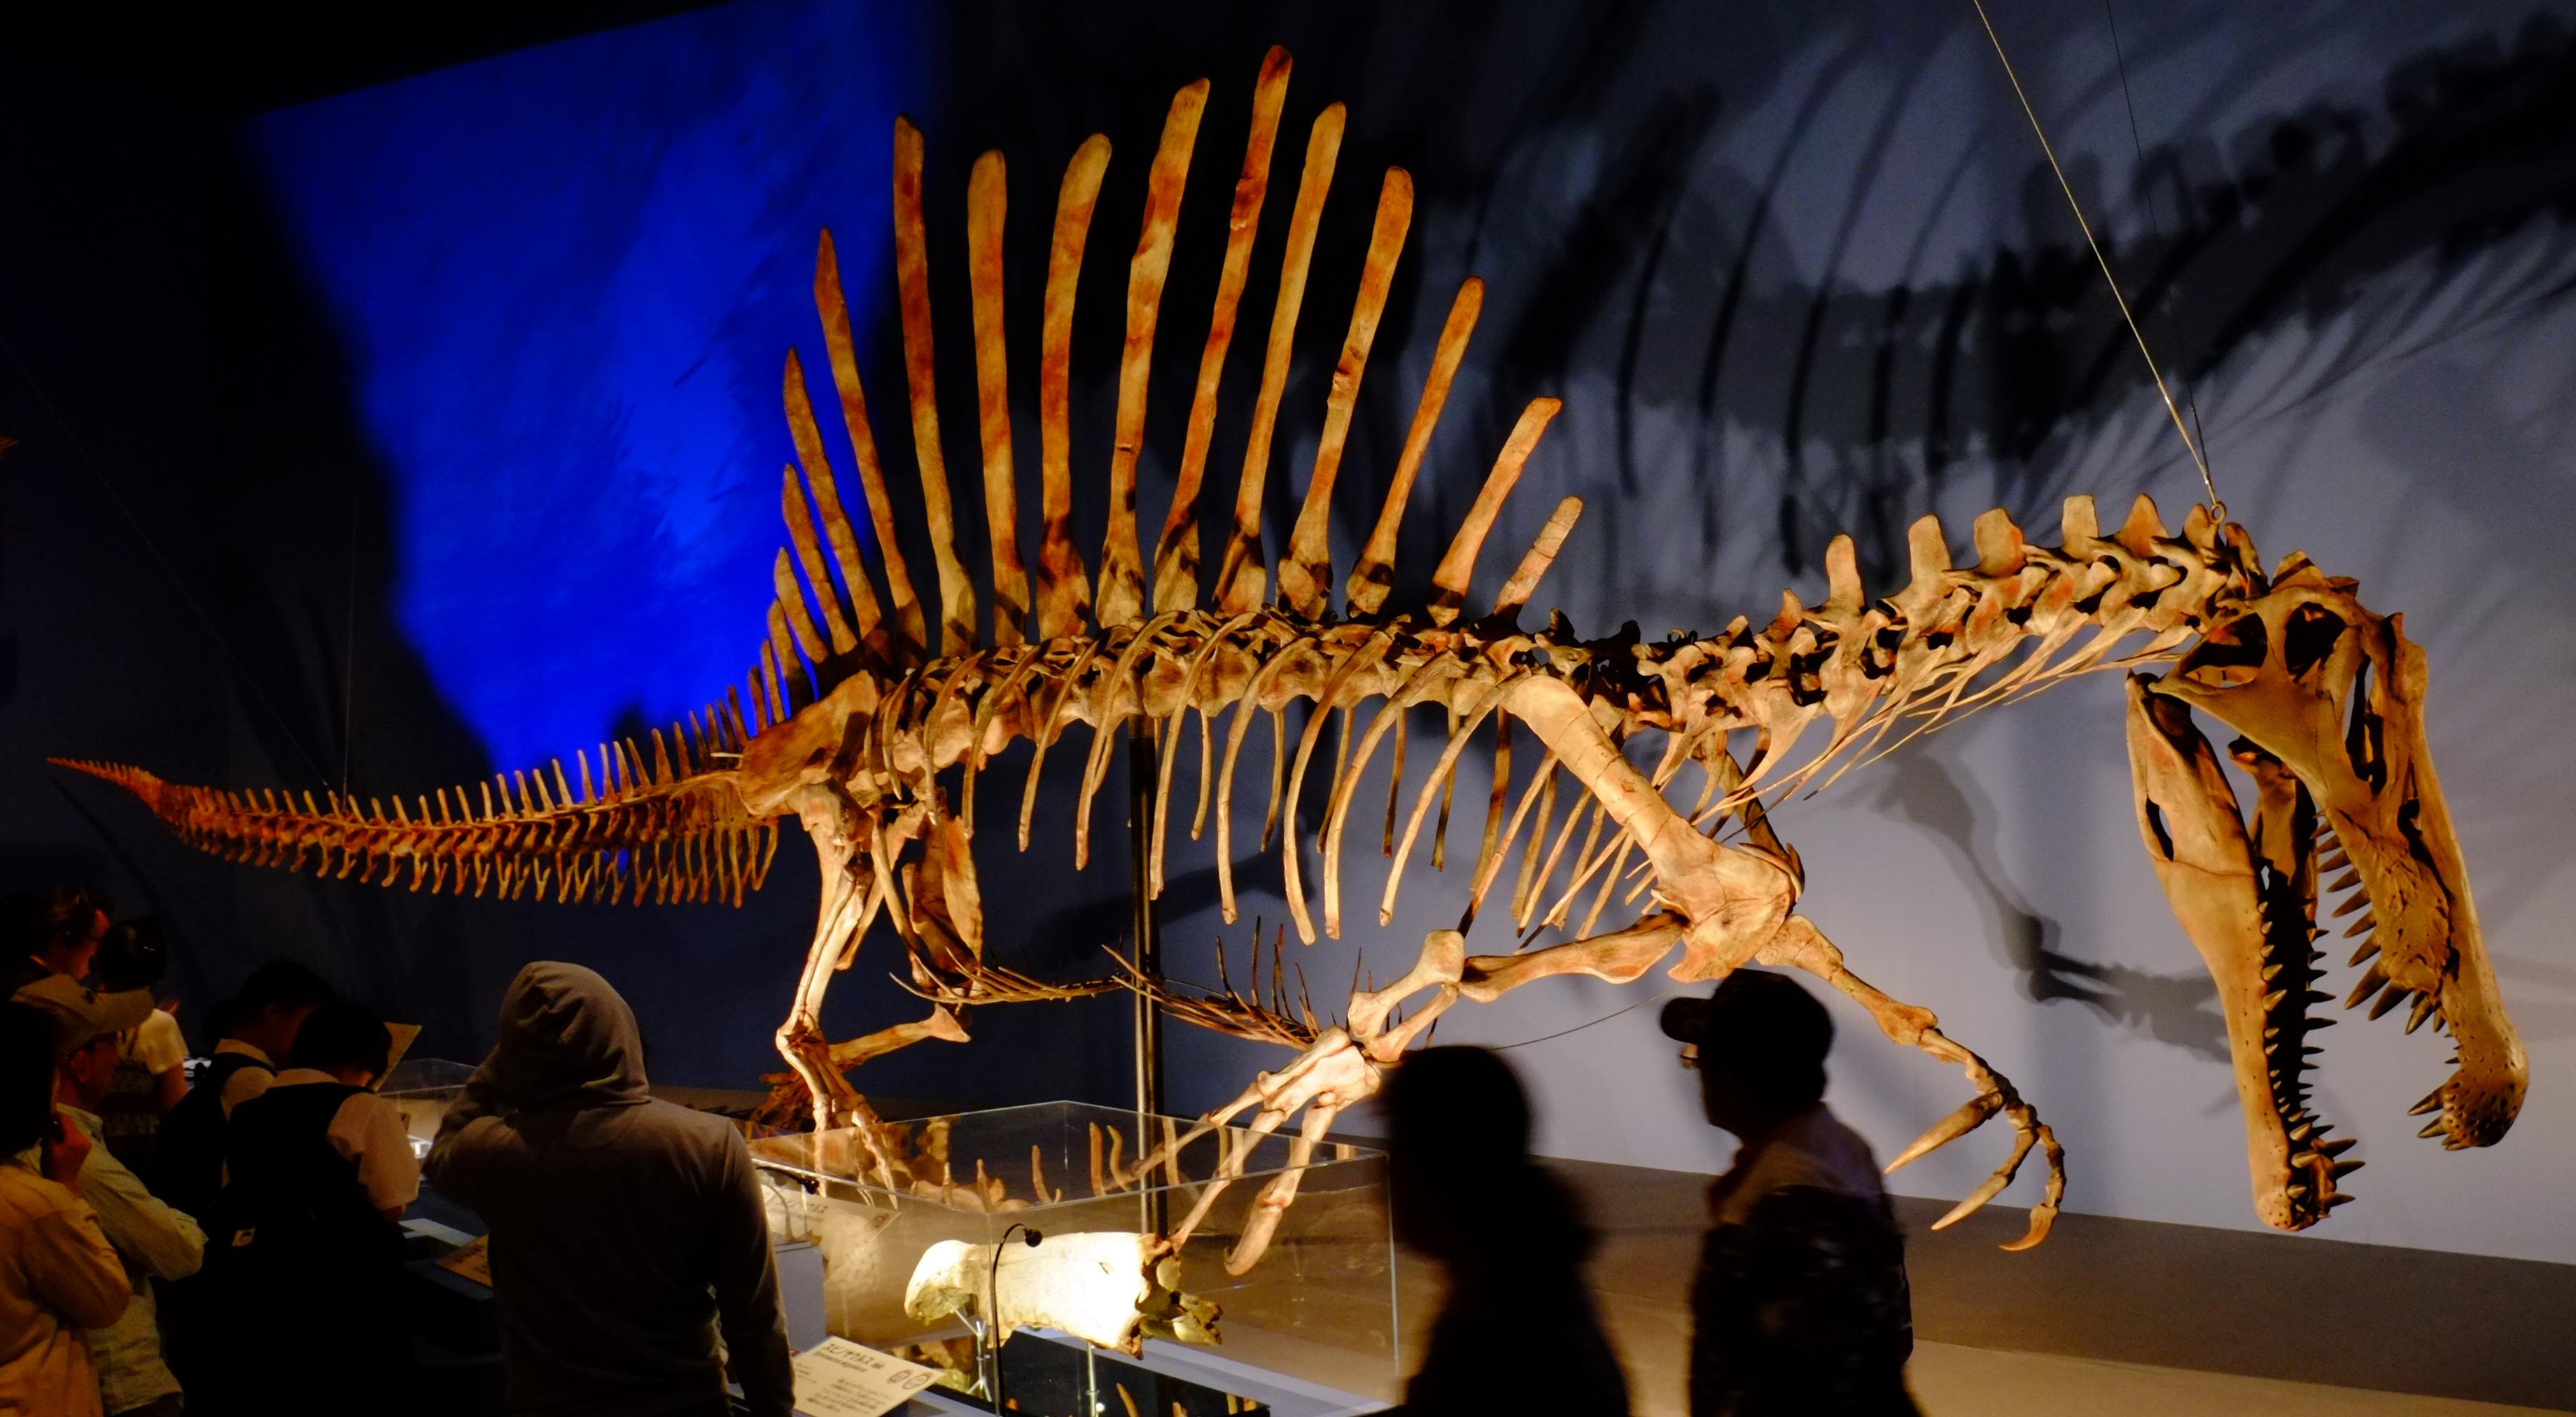 Spinosaurus - Wikipedia